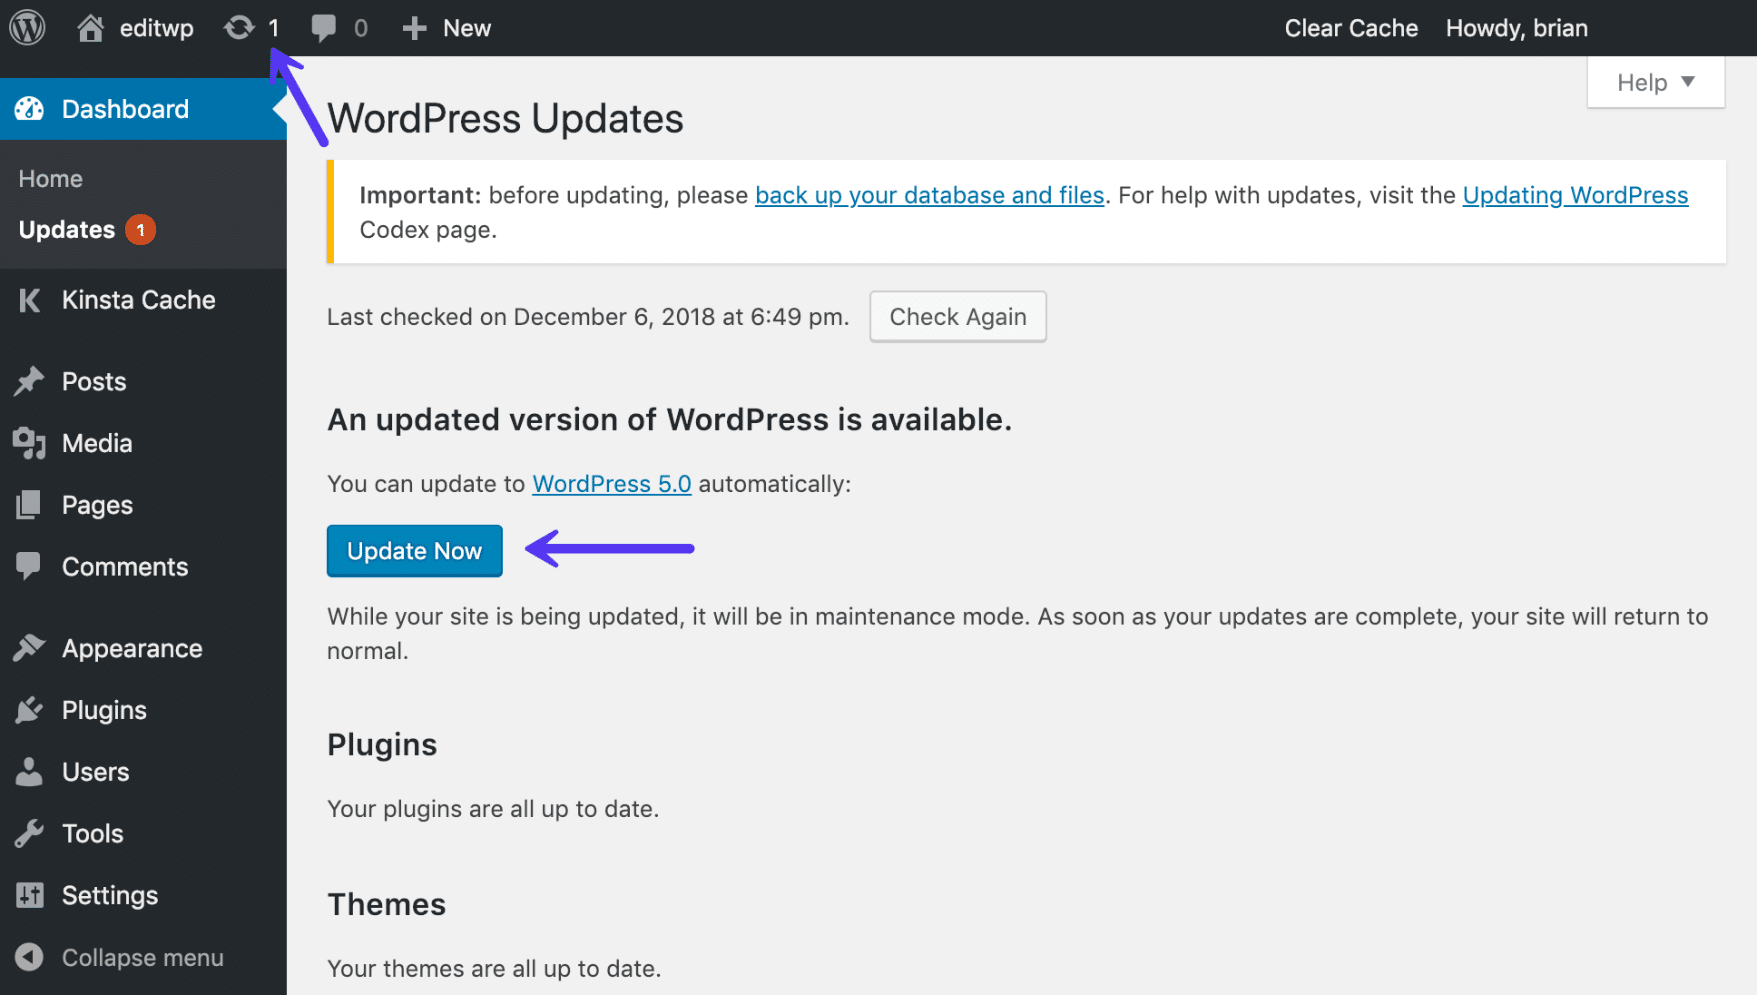 Opdater WordPress-kernen